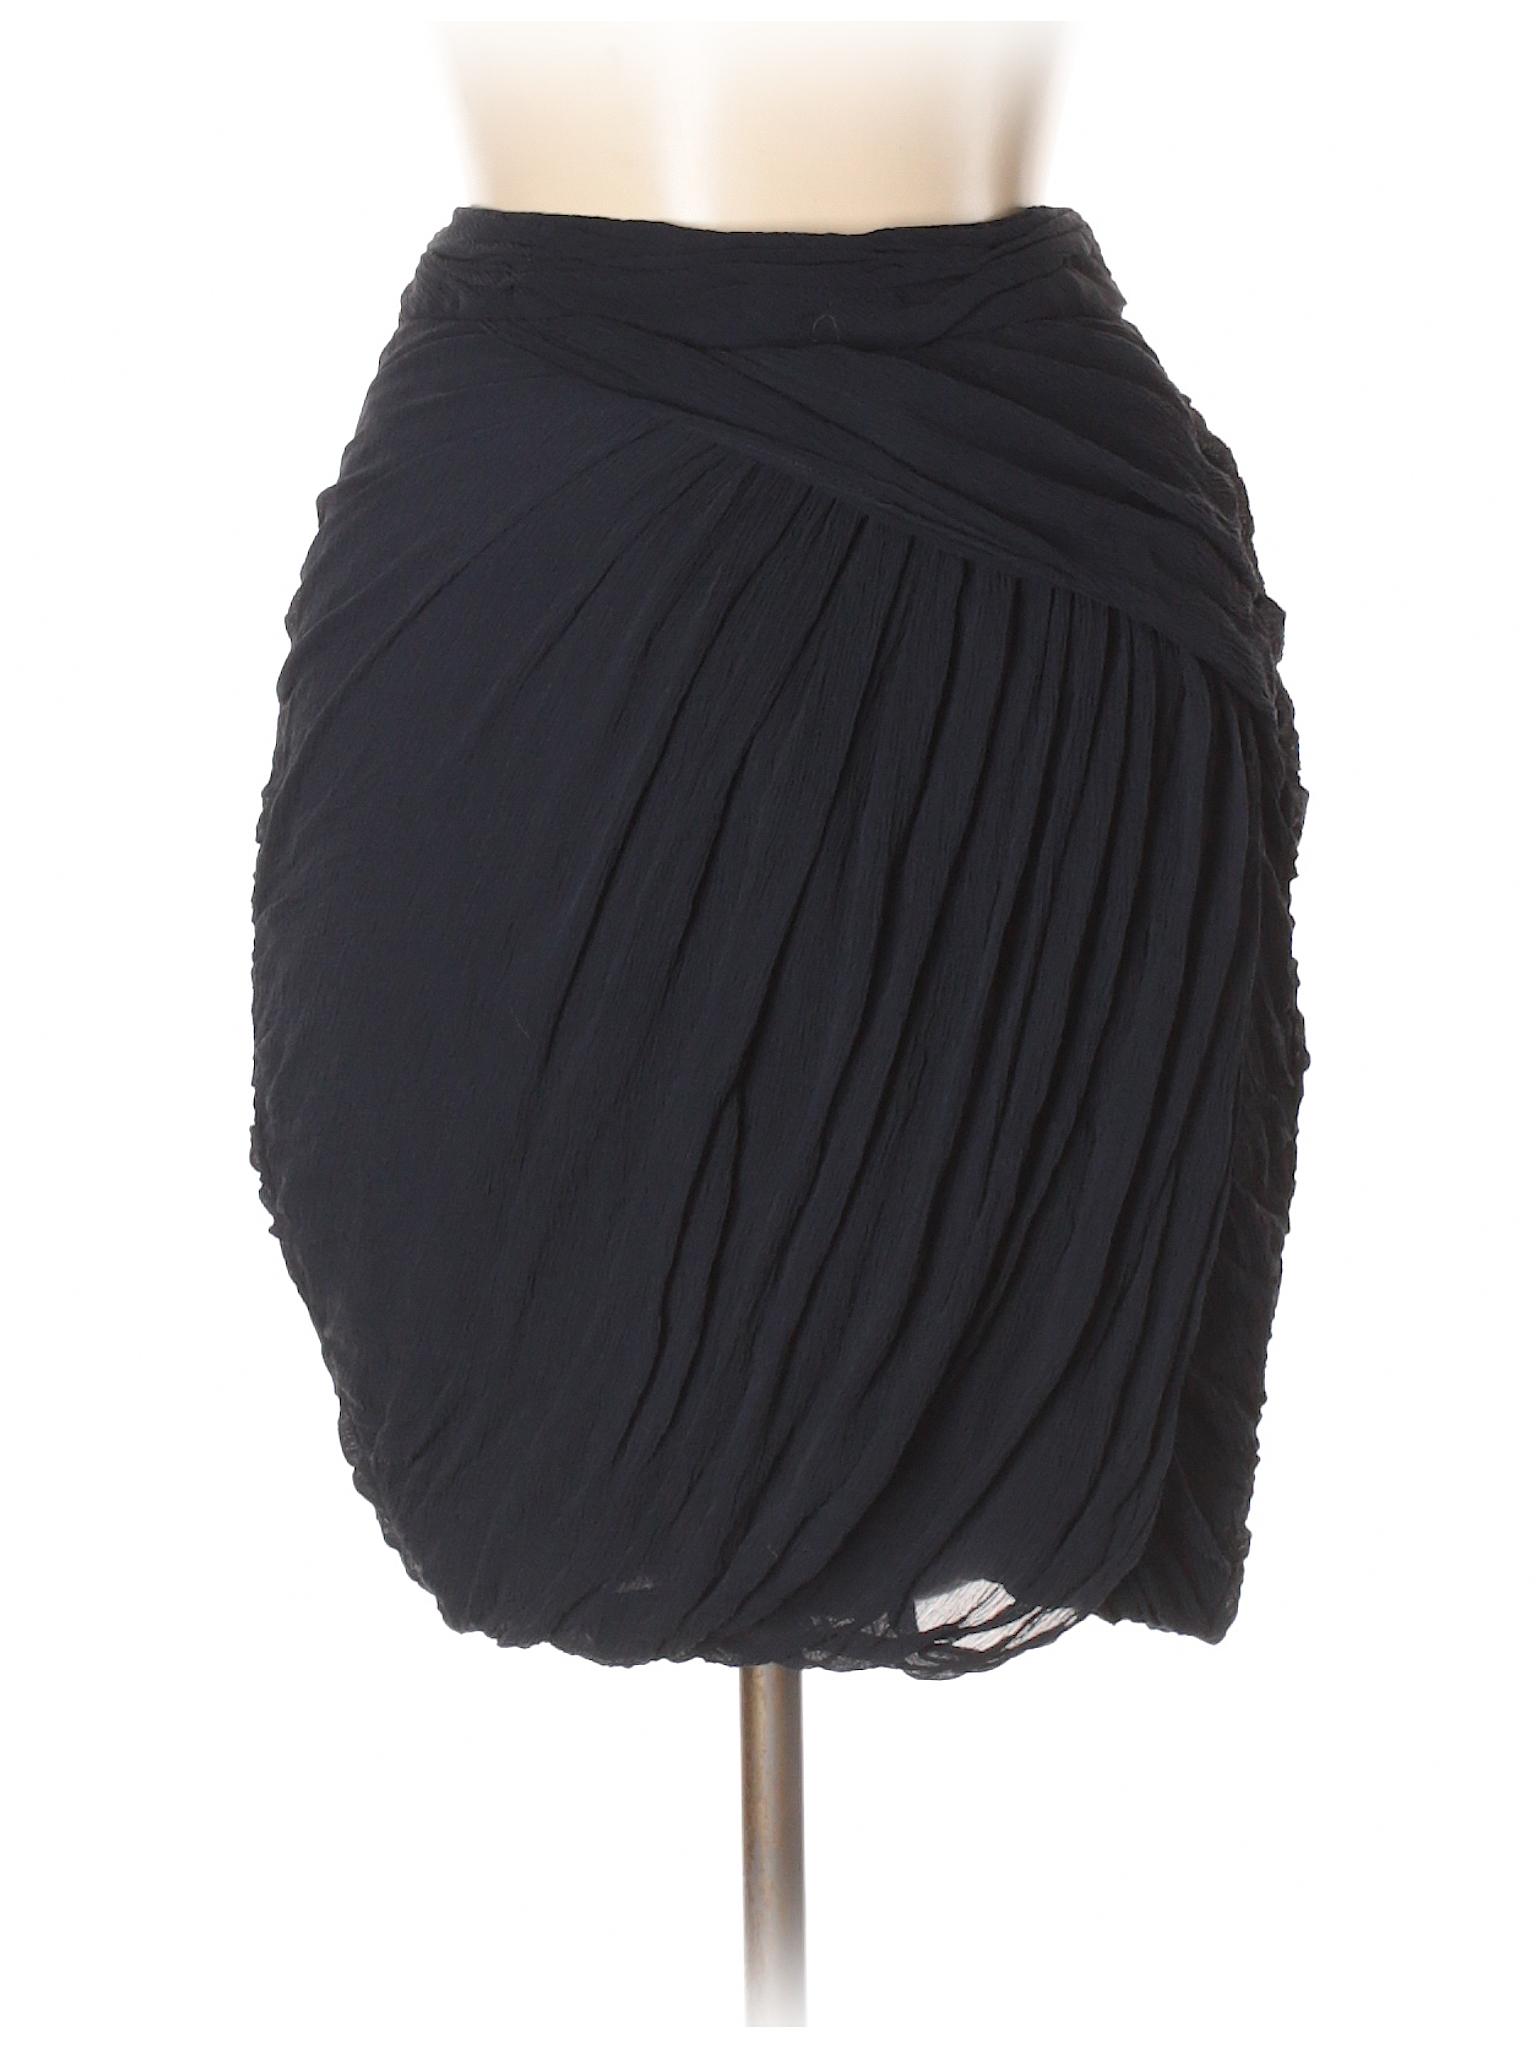 Casual Club leisure Skirt Boutique Monaco qgt0wxx5